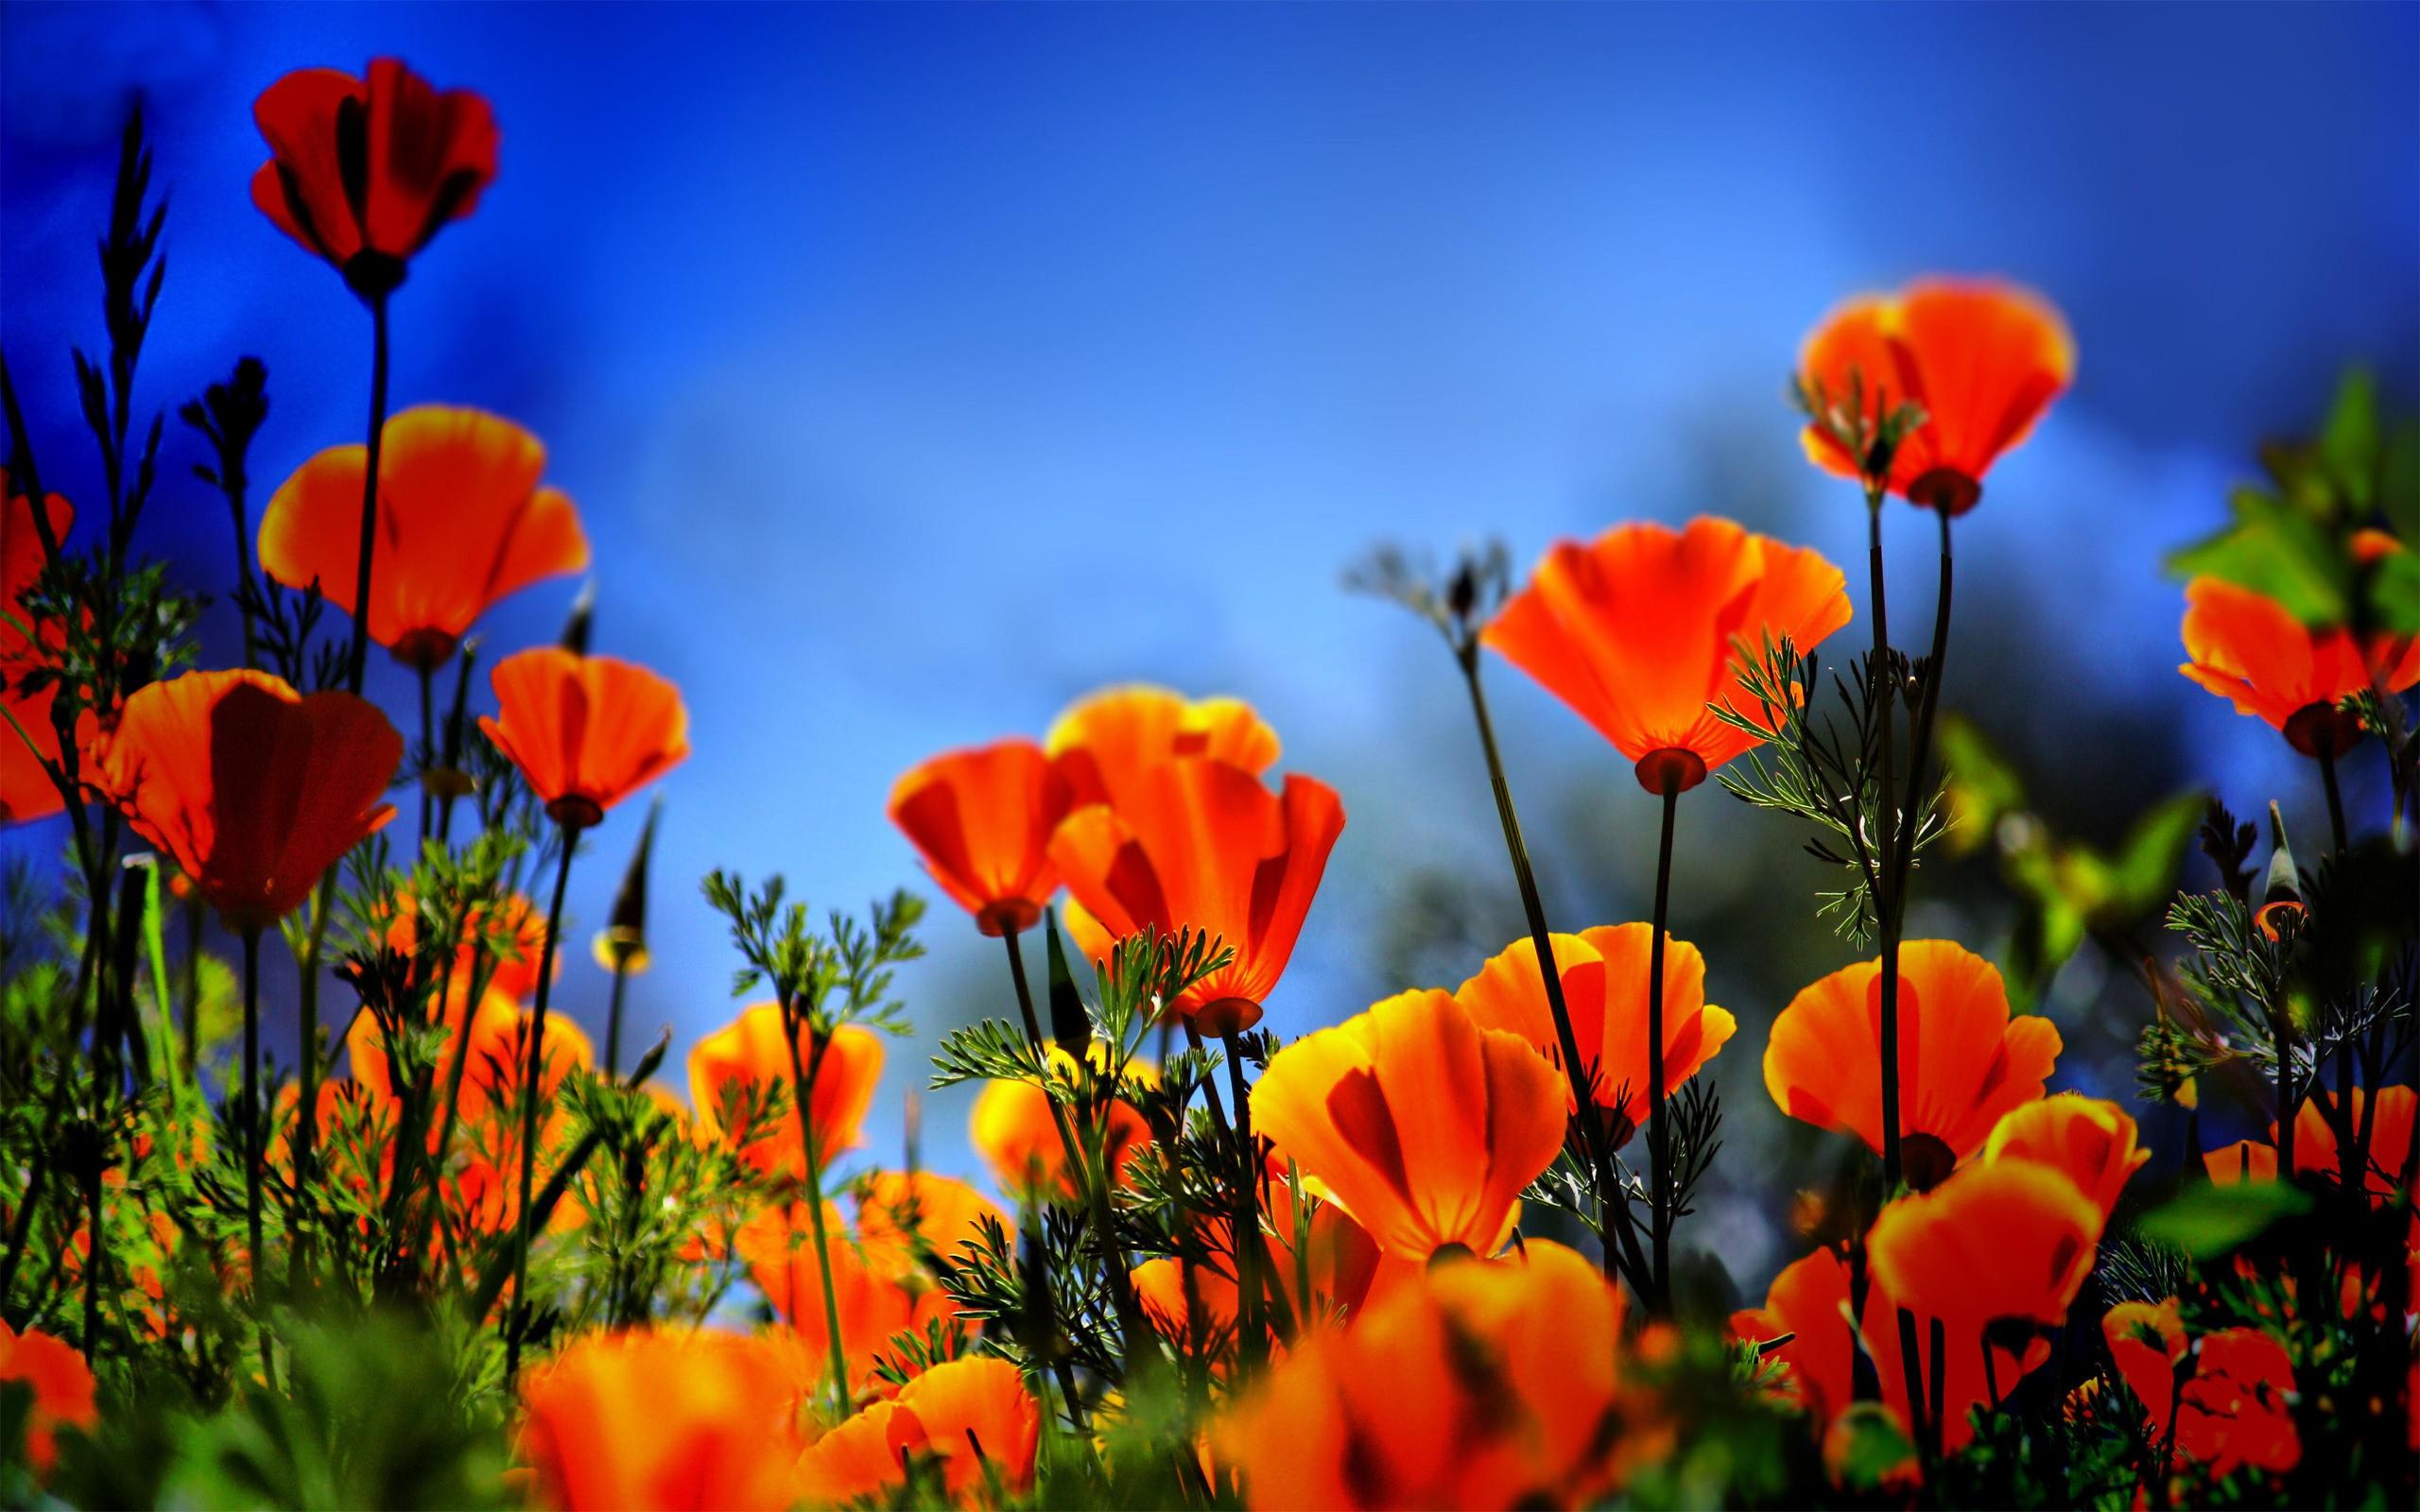 poppy wallpaper 1080P